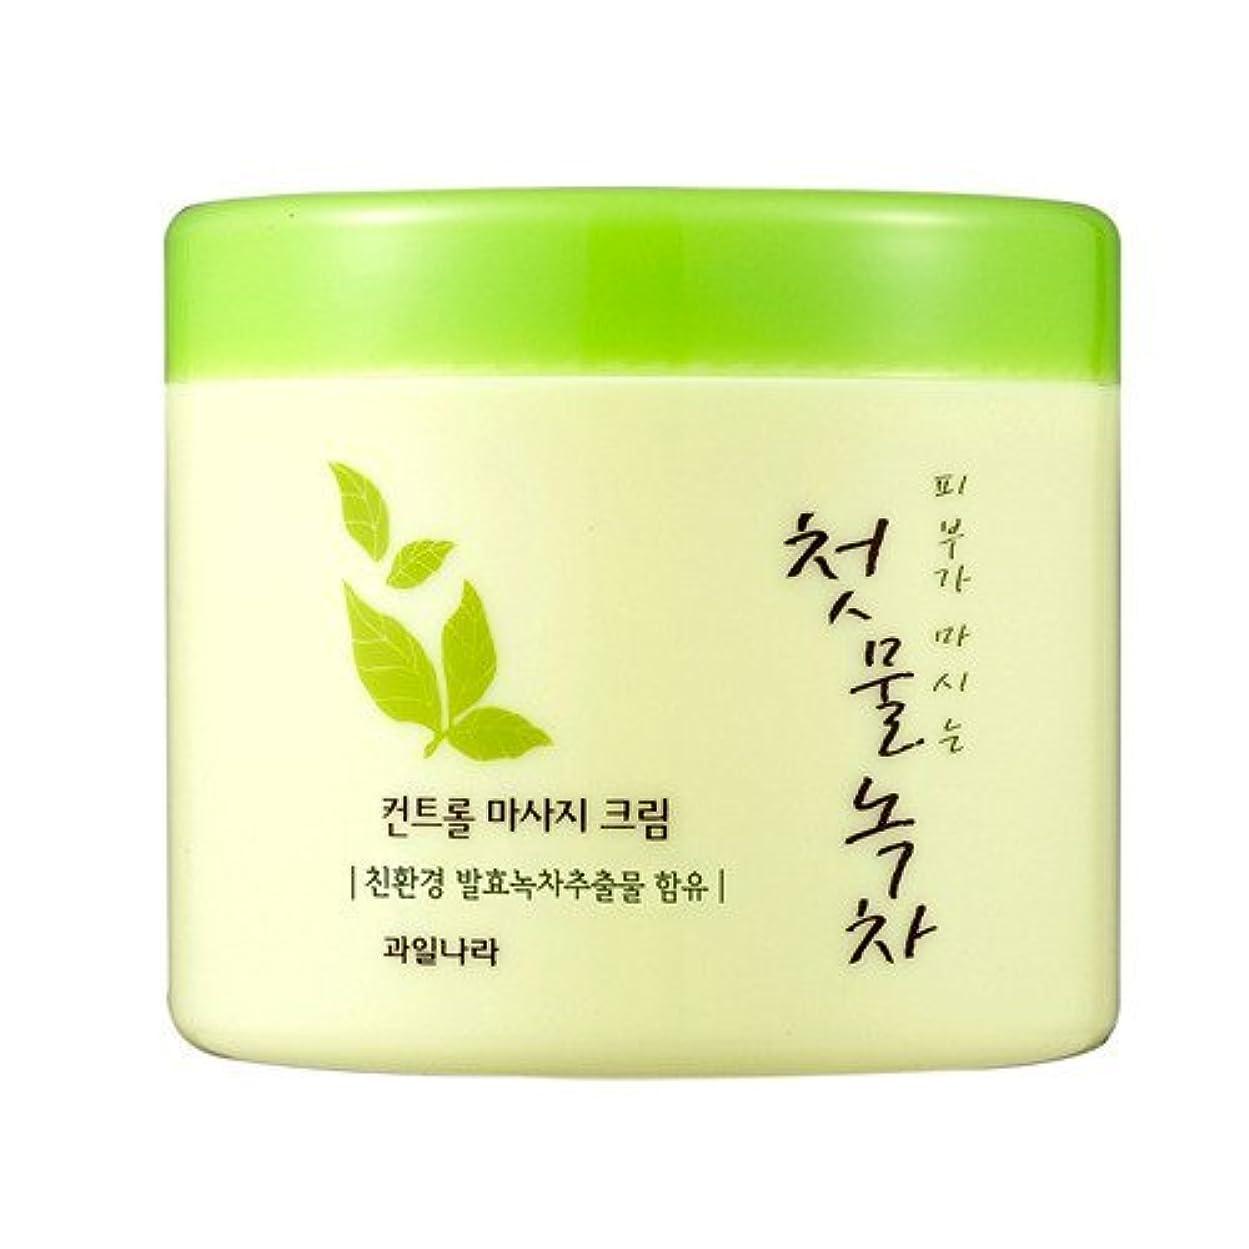 welcos[ウェルコス] コントロールマッサージクリーム300ml/First Green Tea Control Massage Cream 300ml [並行輸入品]